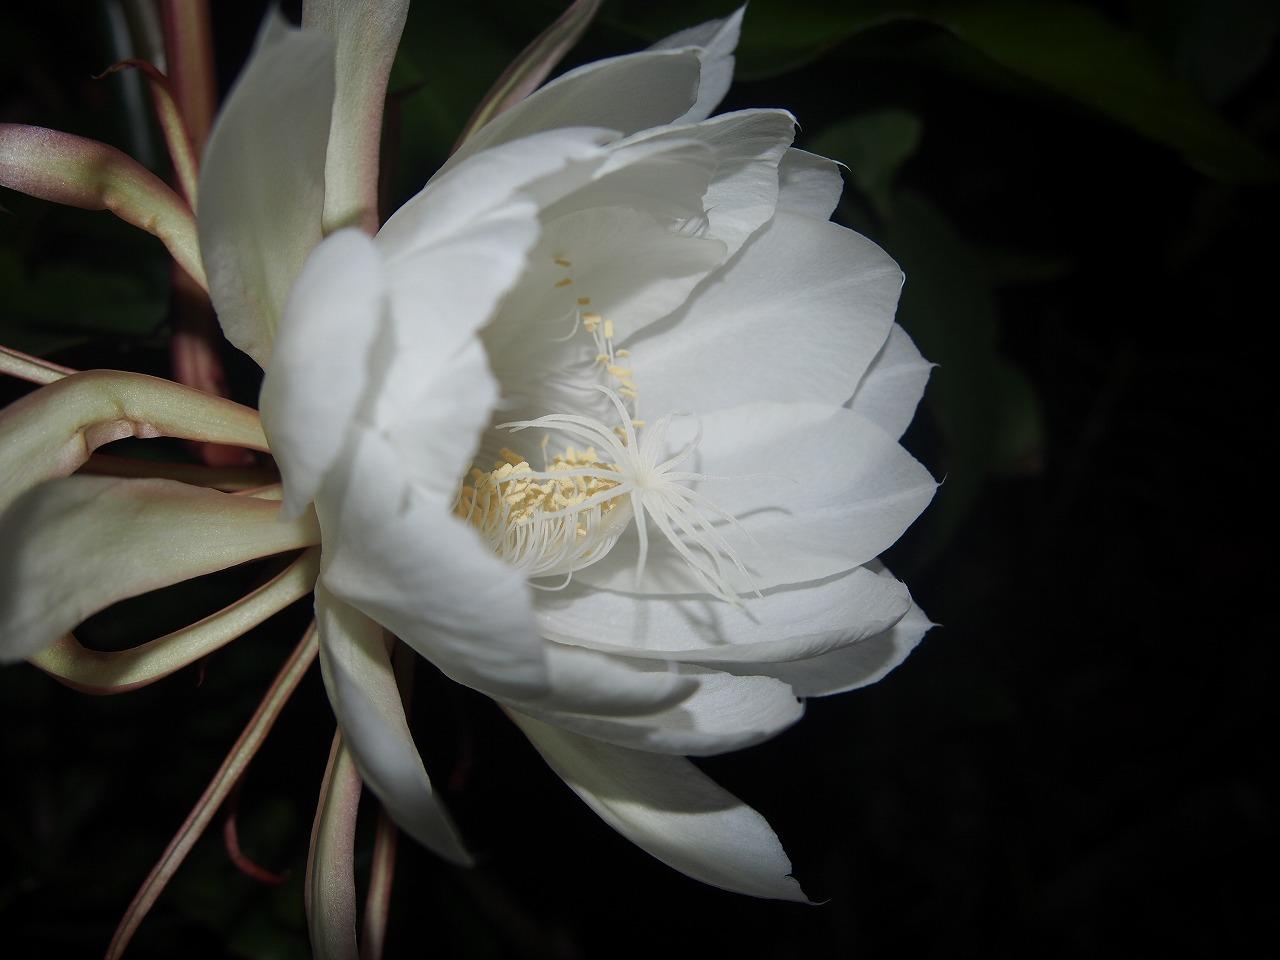 20170707-EpiphyllumOxpetalum-O06.jpg